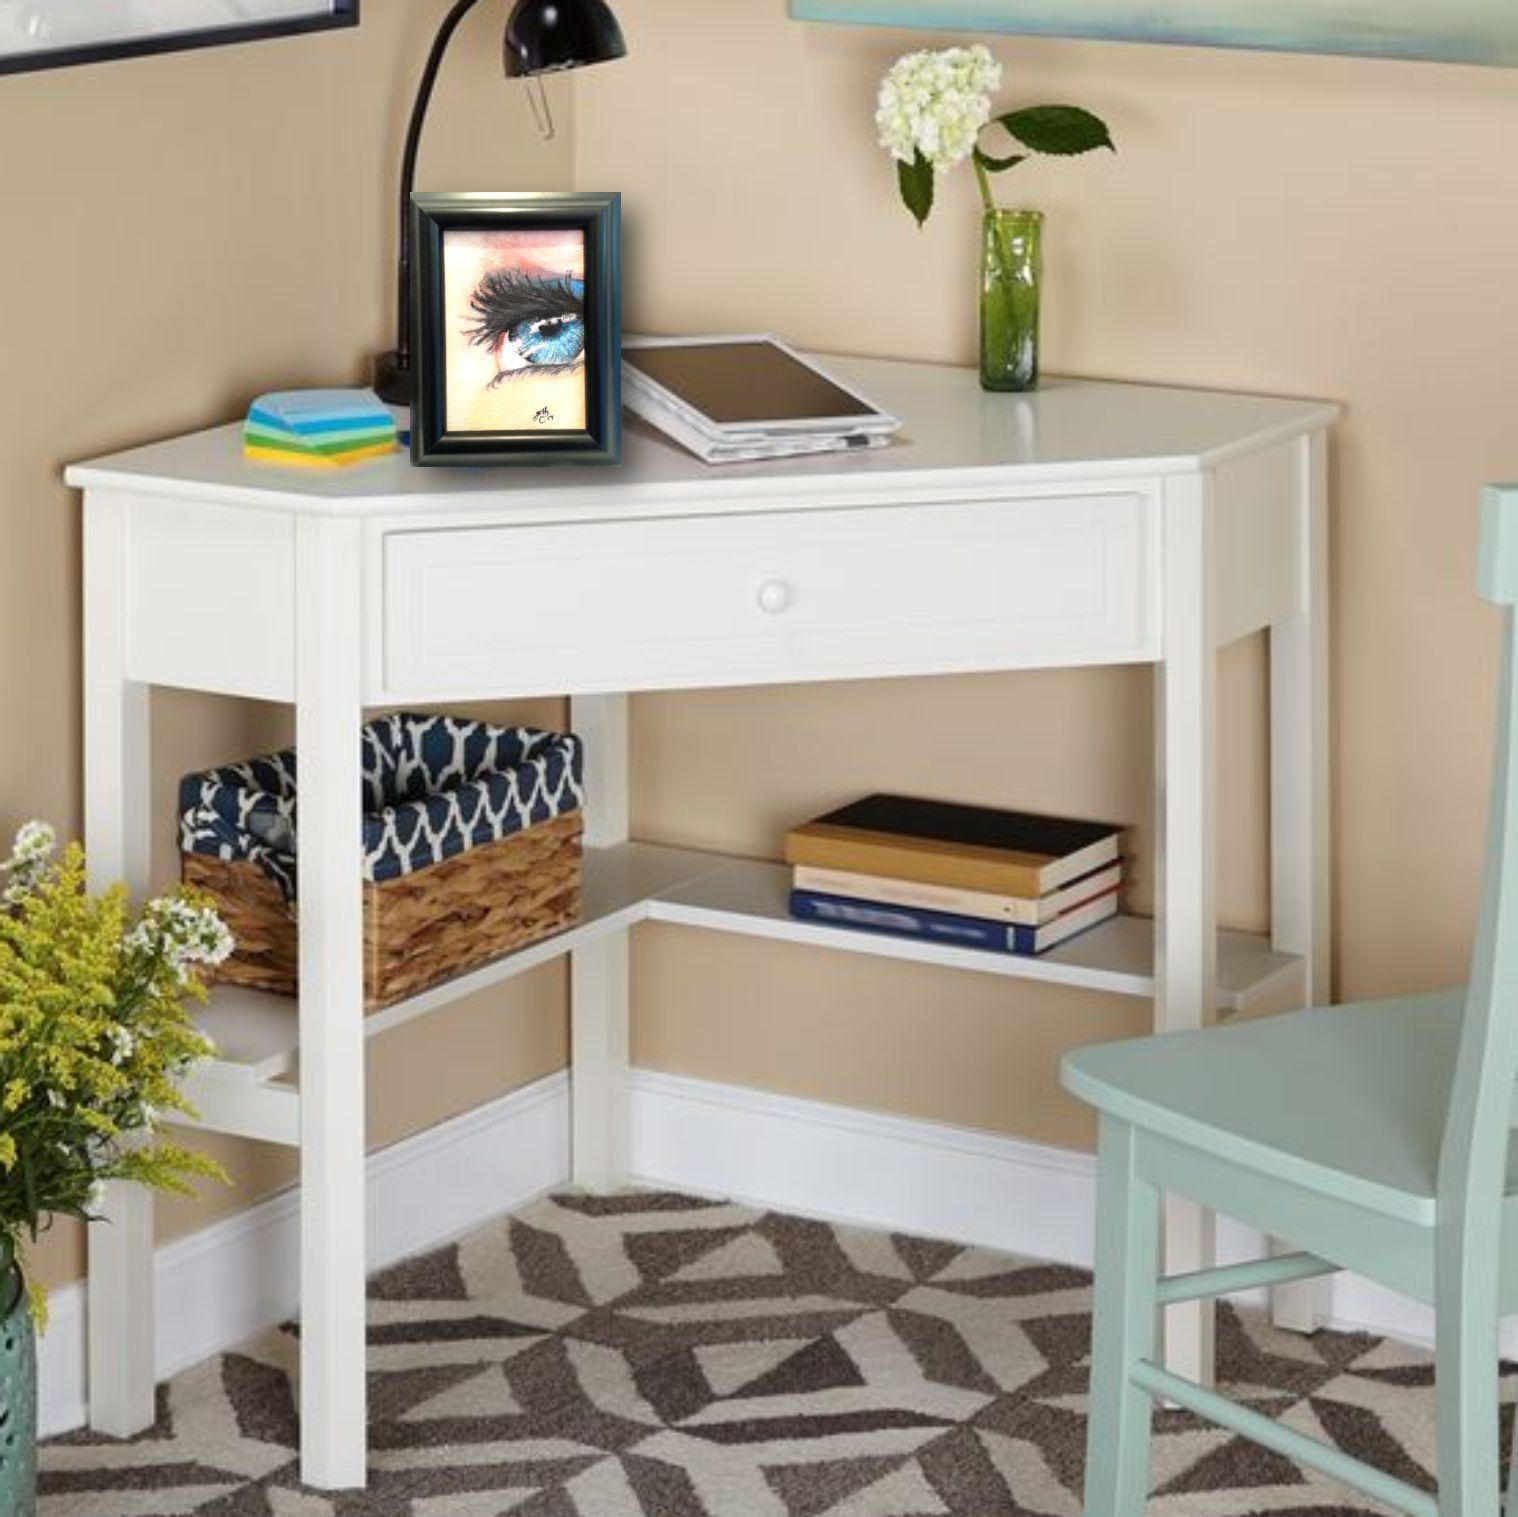 Top 30 Stunning Office Design Homeoffice365 Homeofficechairs Homeofficeikea Homeofficefurniturenearme Homeoff Desks For Small Spaces Corner Writing Desk Home